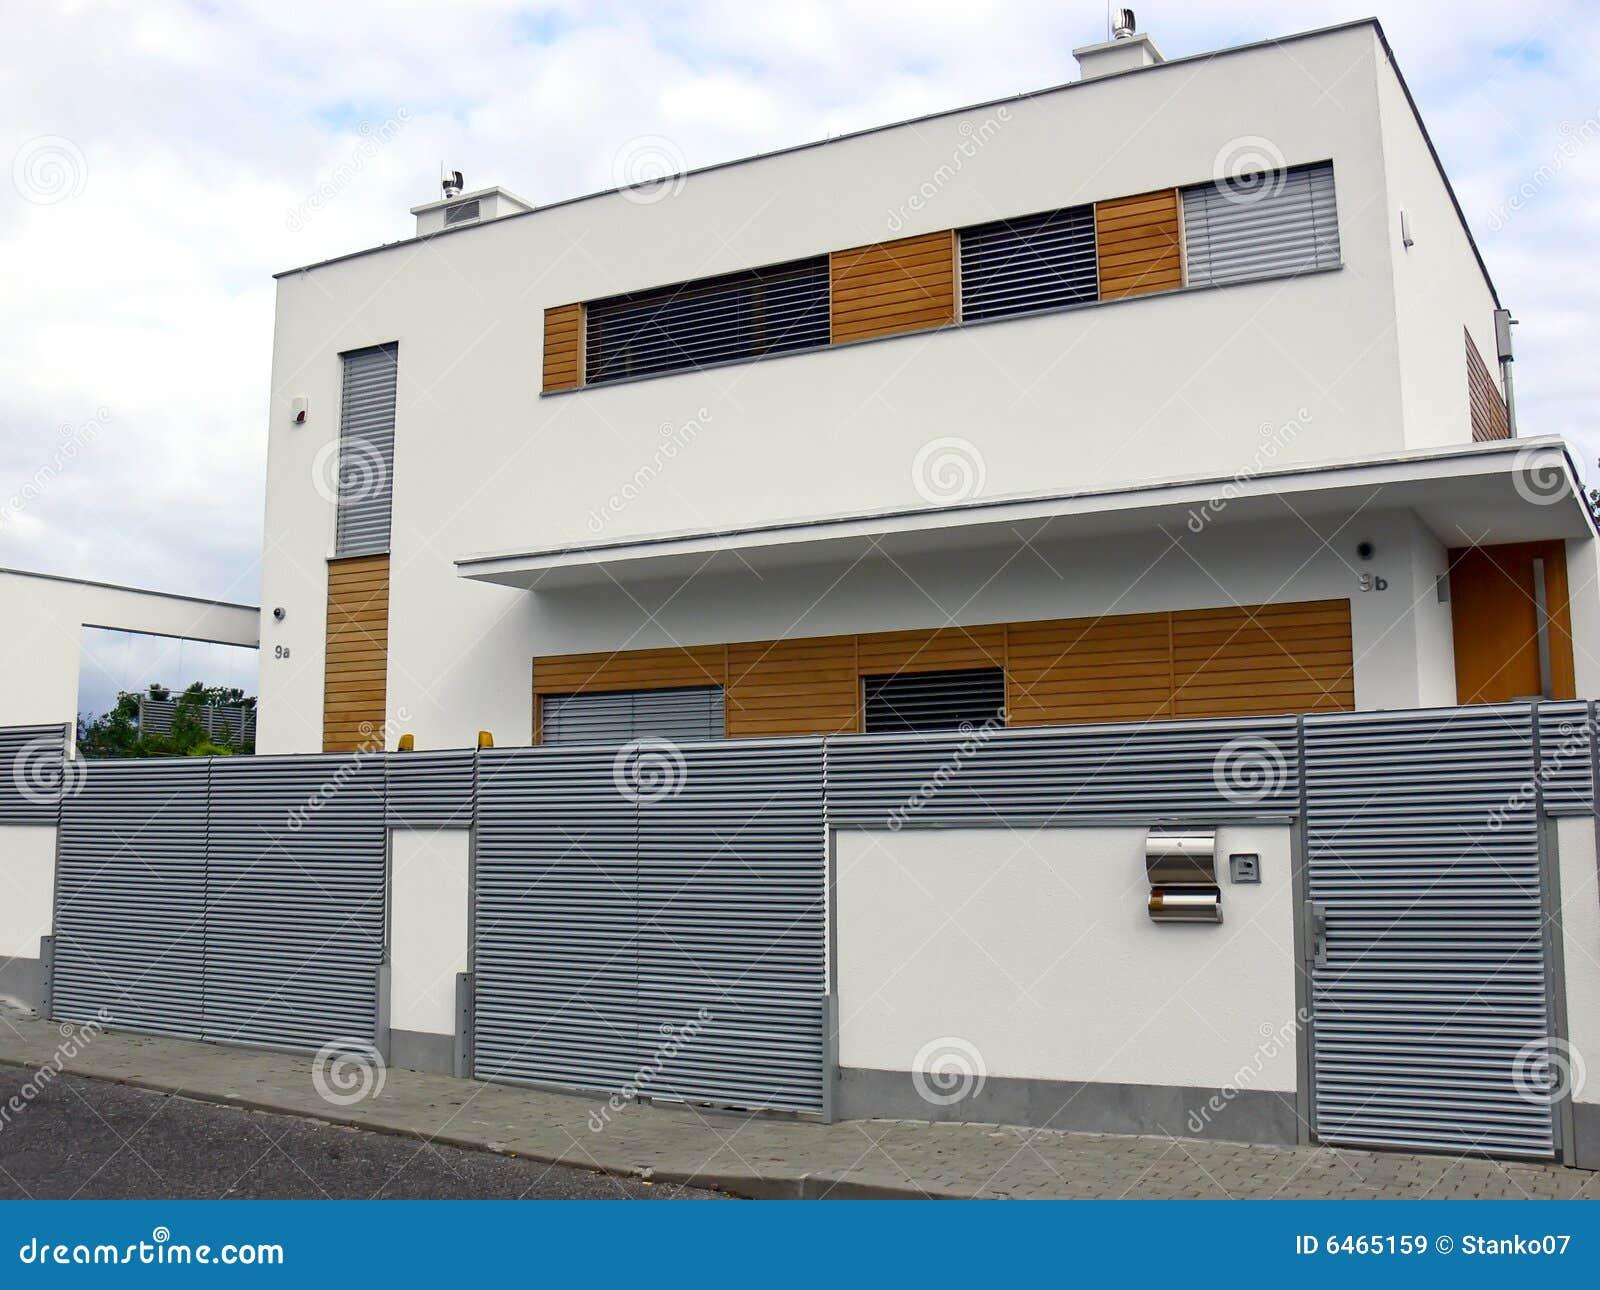 Modernes haus lizenzfreie stockbilder bild 6465159 for Modernes haus design